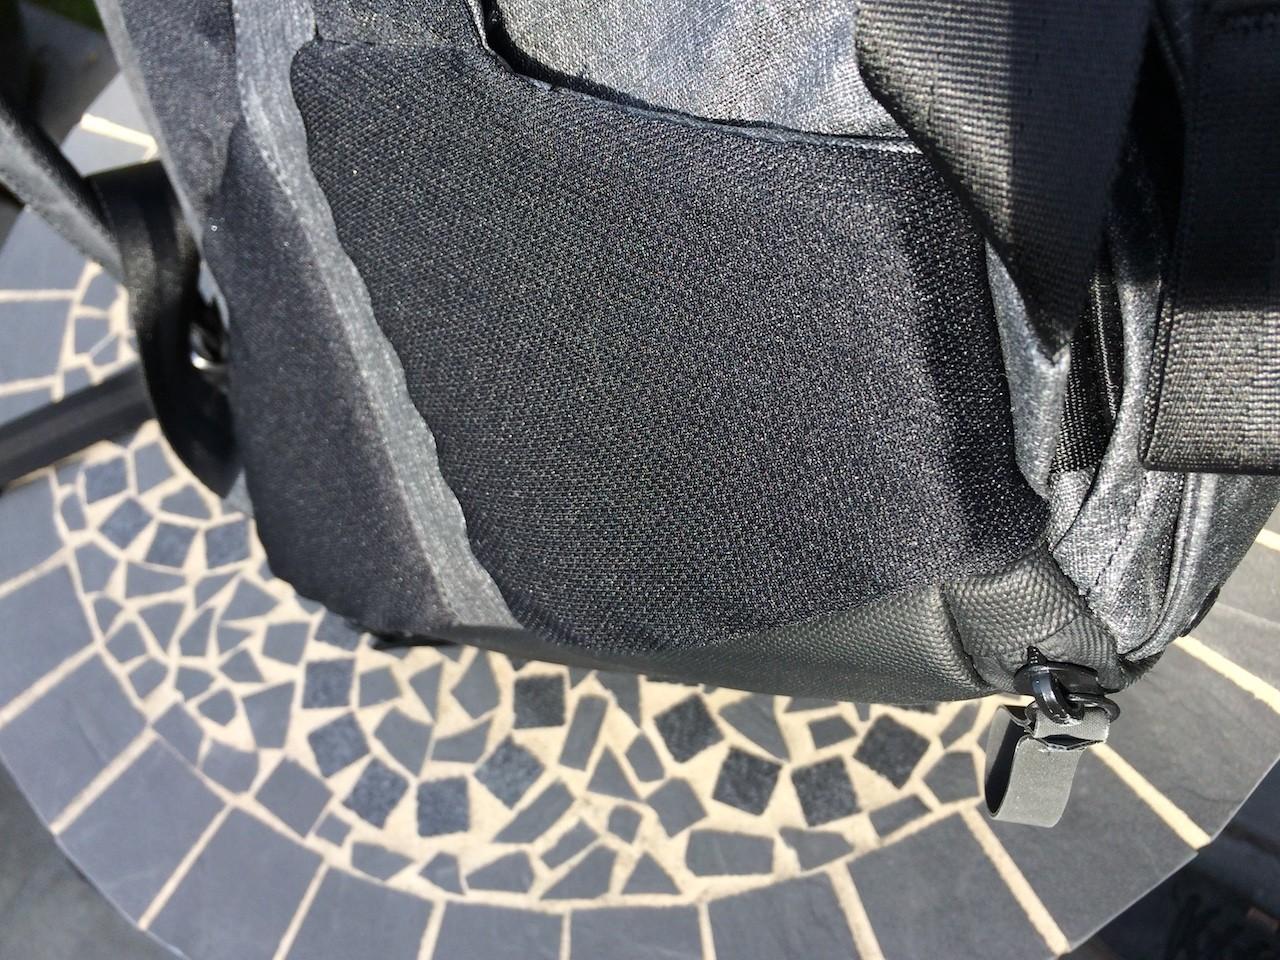 Peak Design Everyday Backpack lower back cushion